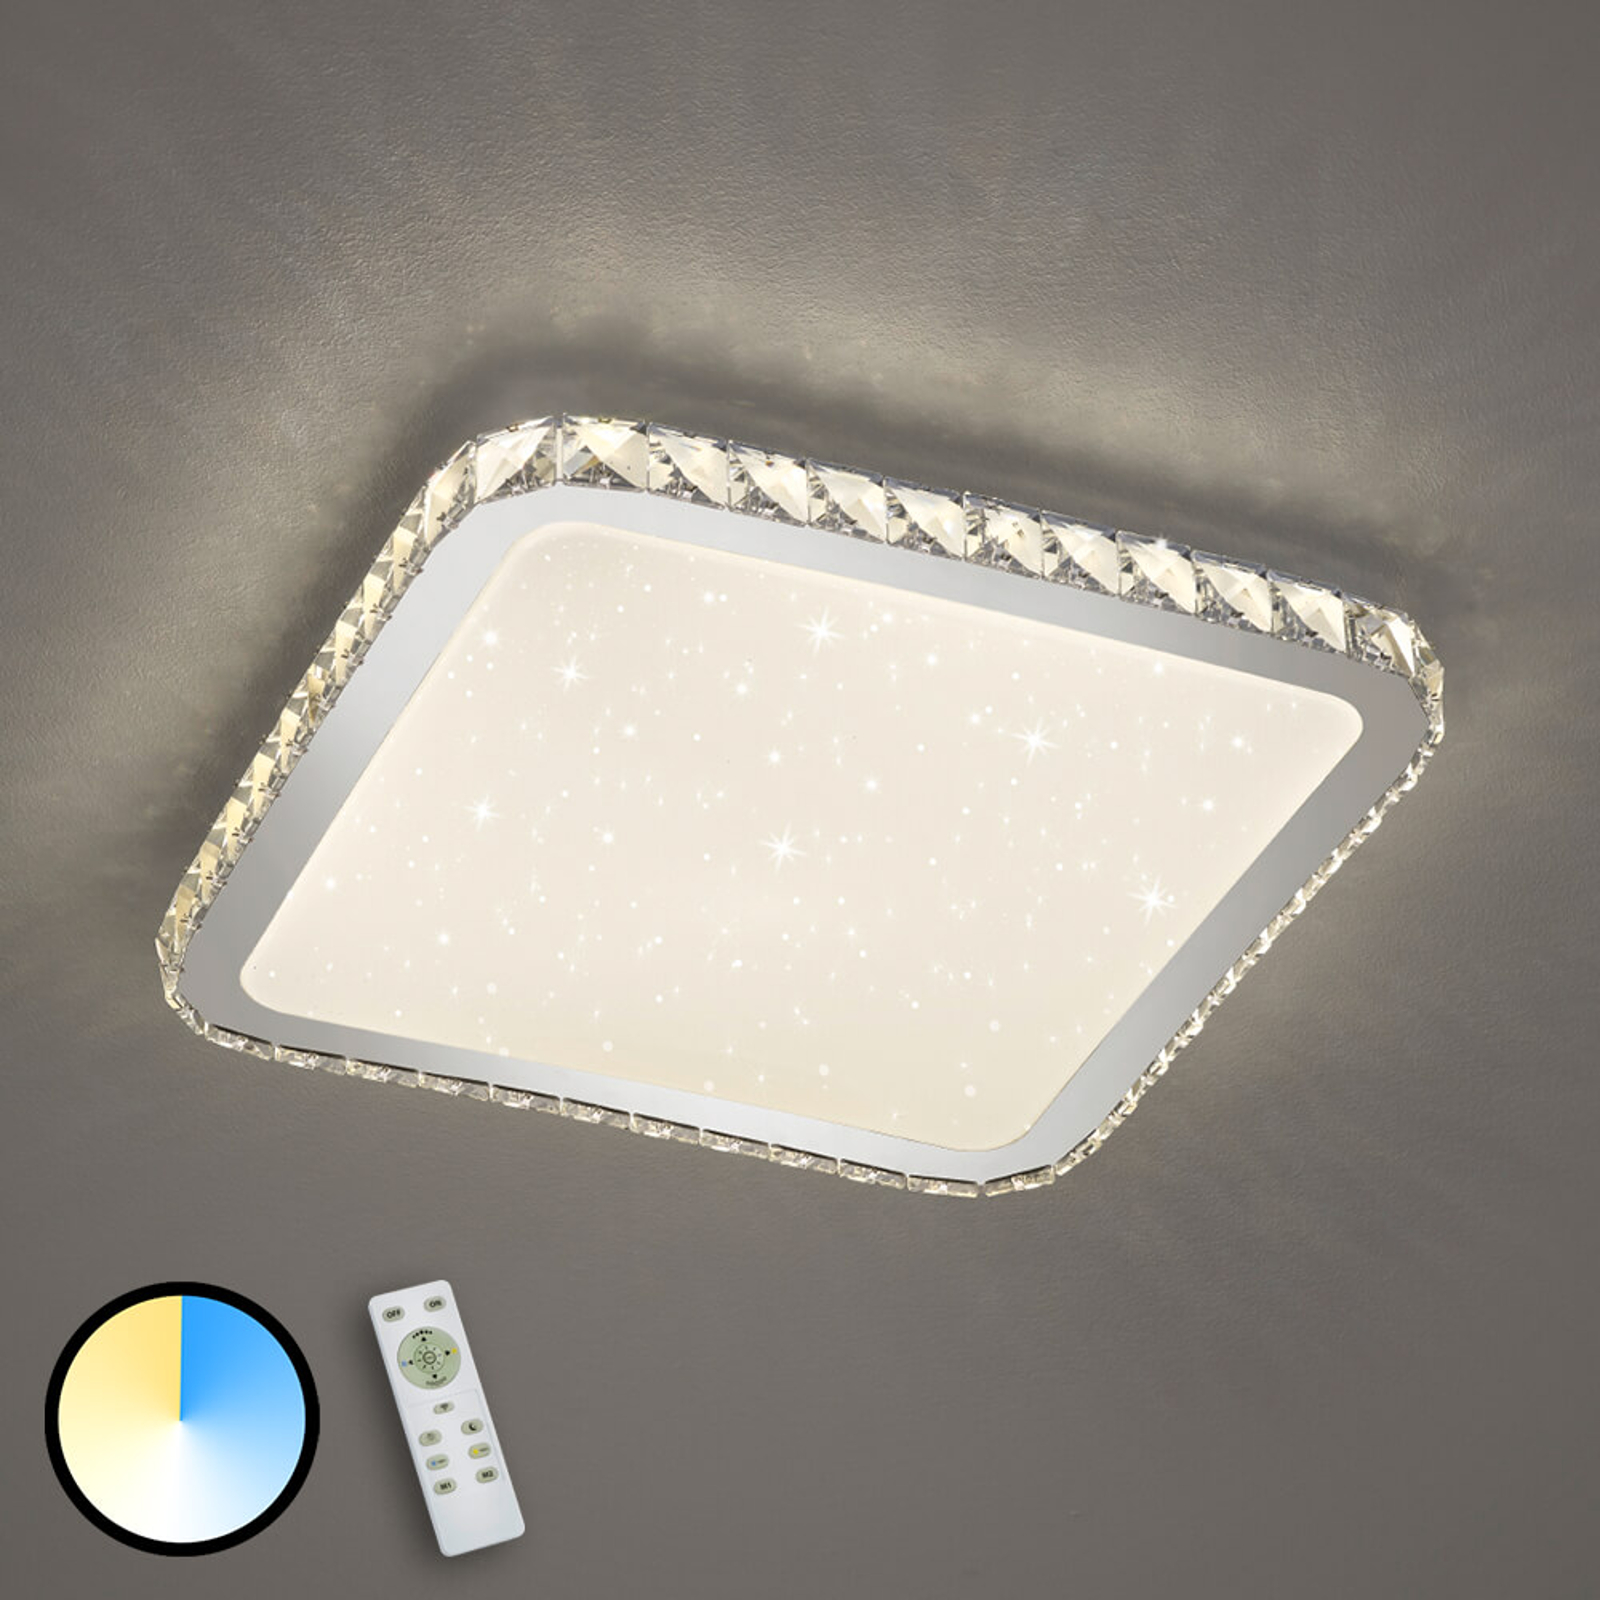 Lampa sufitowa LED Sapporo z powłoką starlight